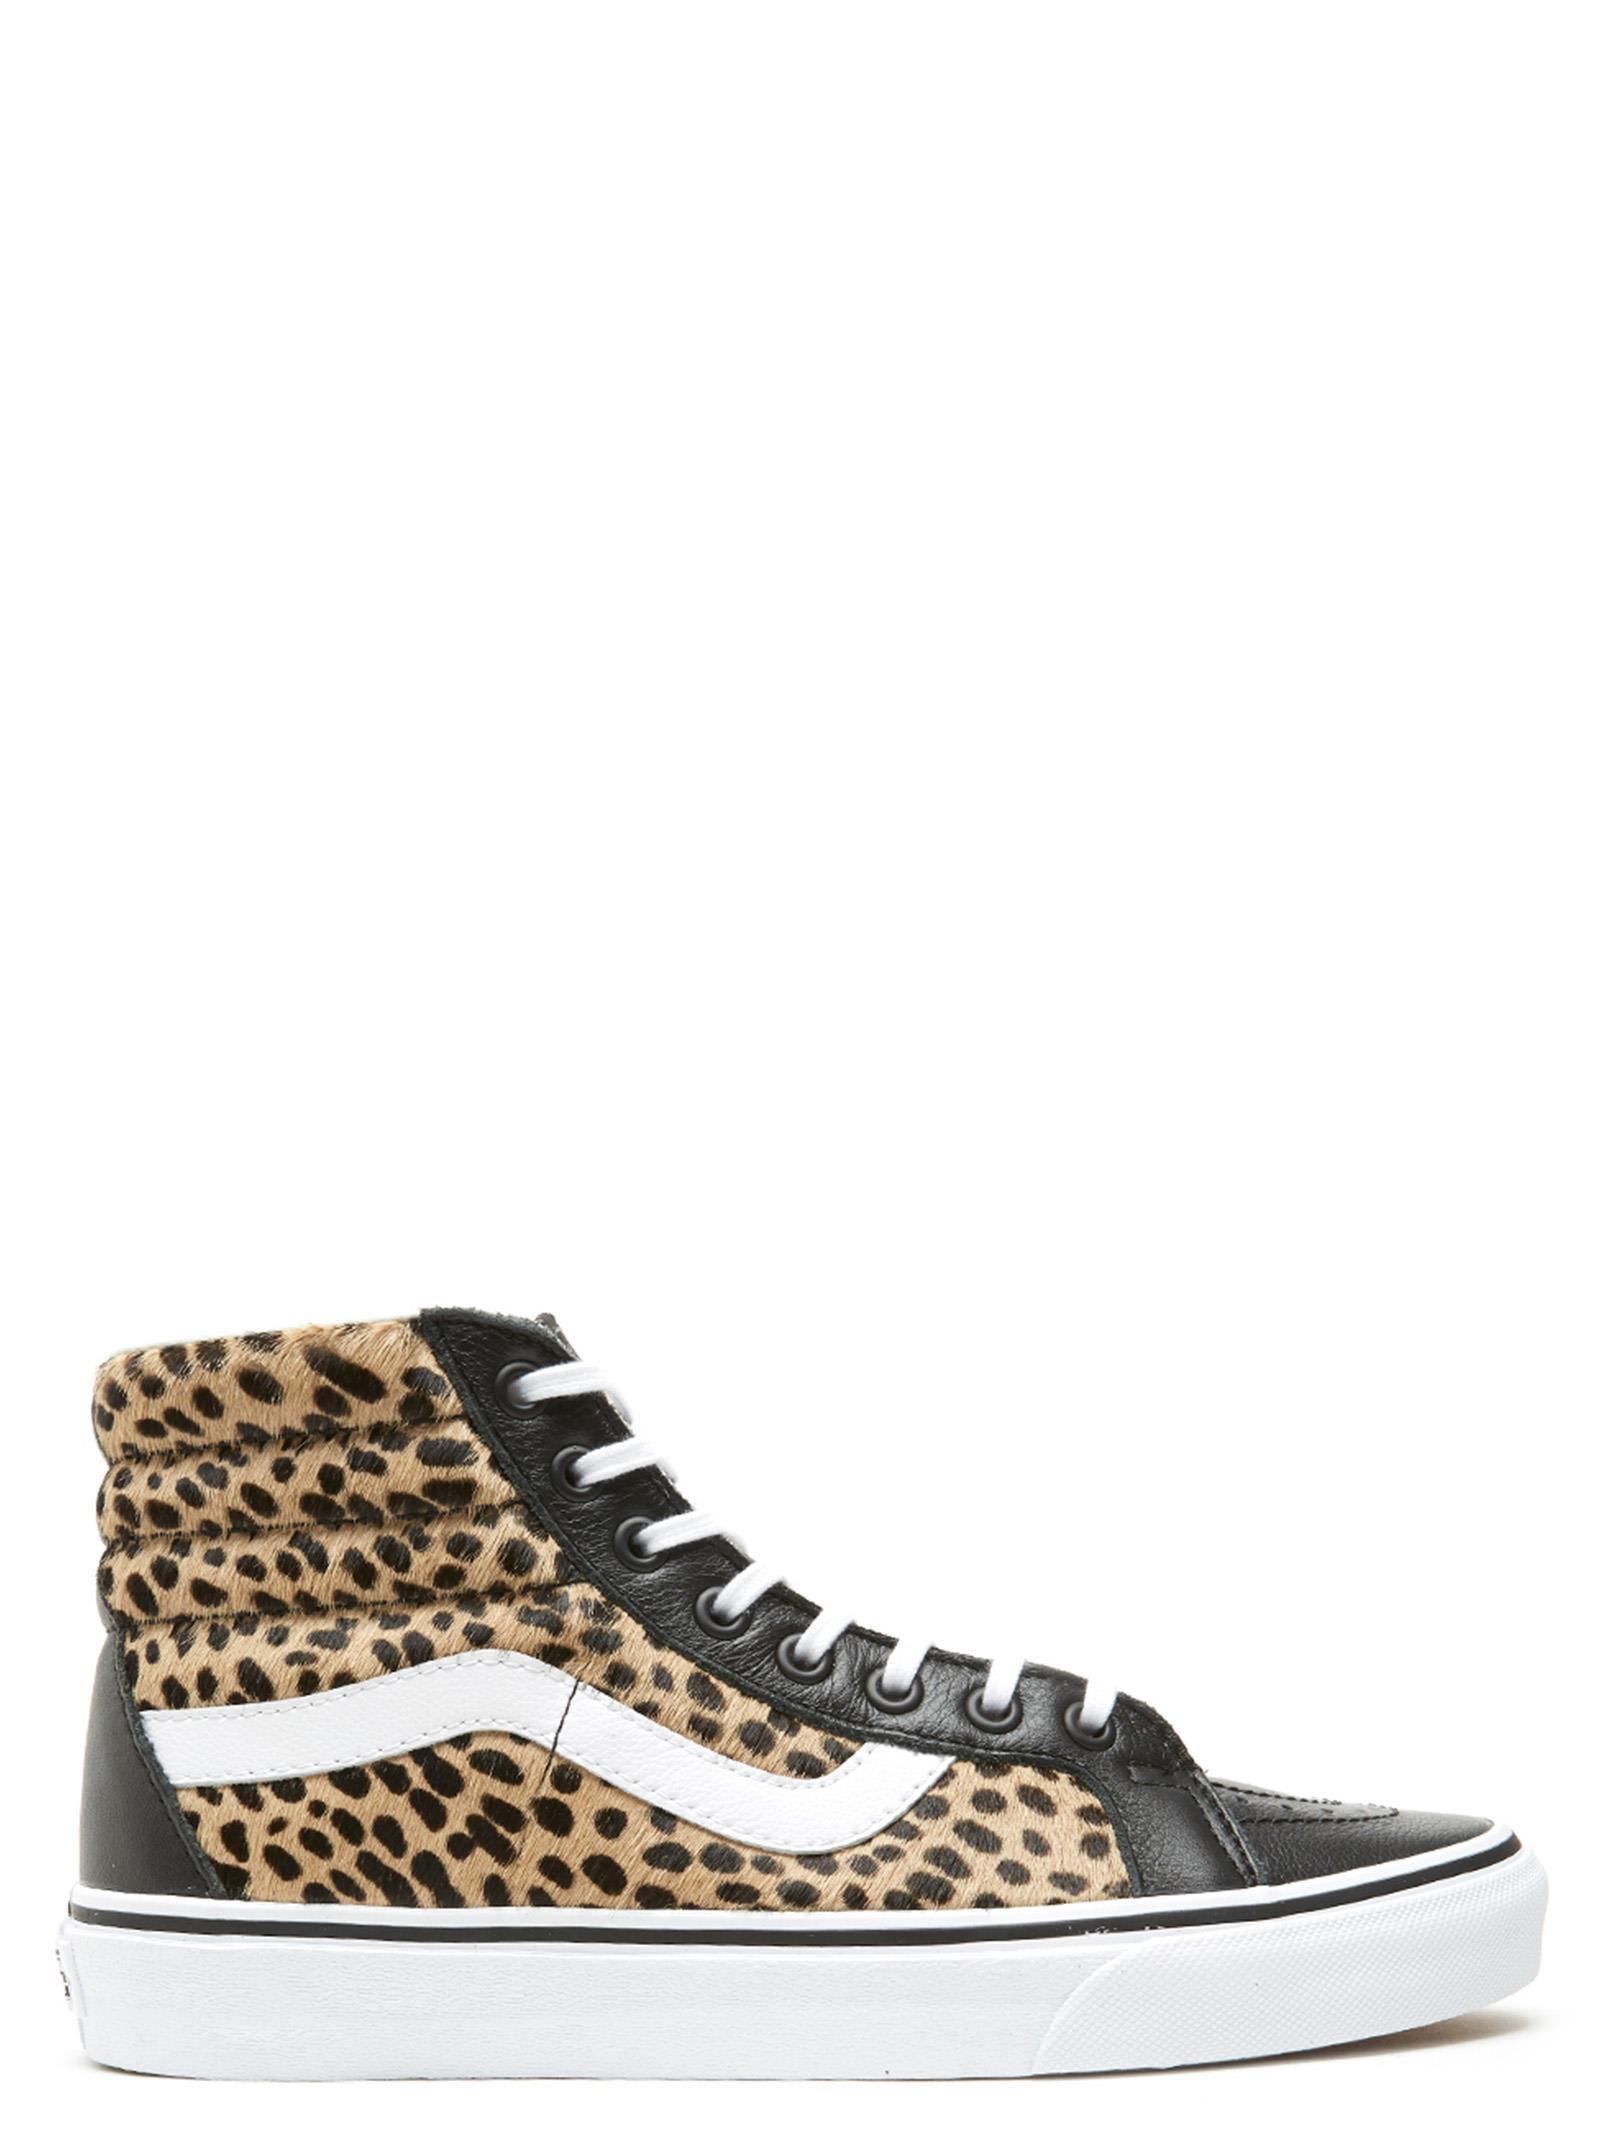 Vans Vans 'sk8-hi Reissue' Shoes